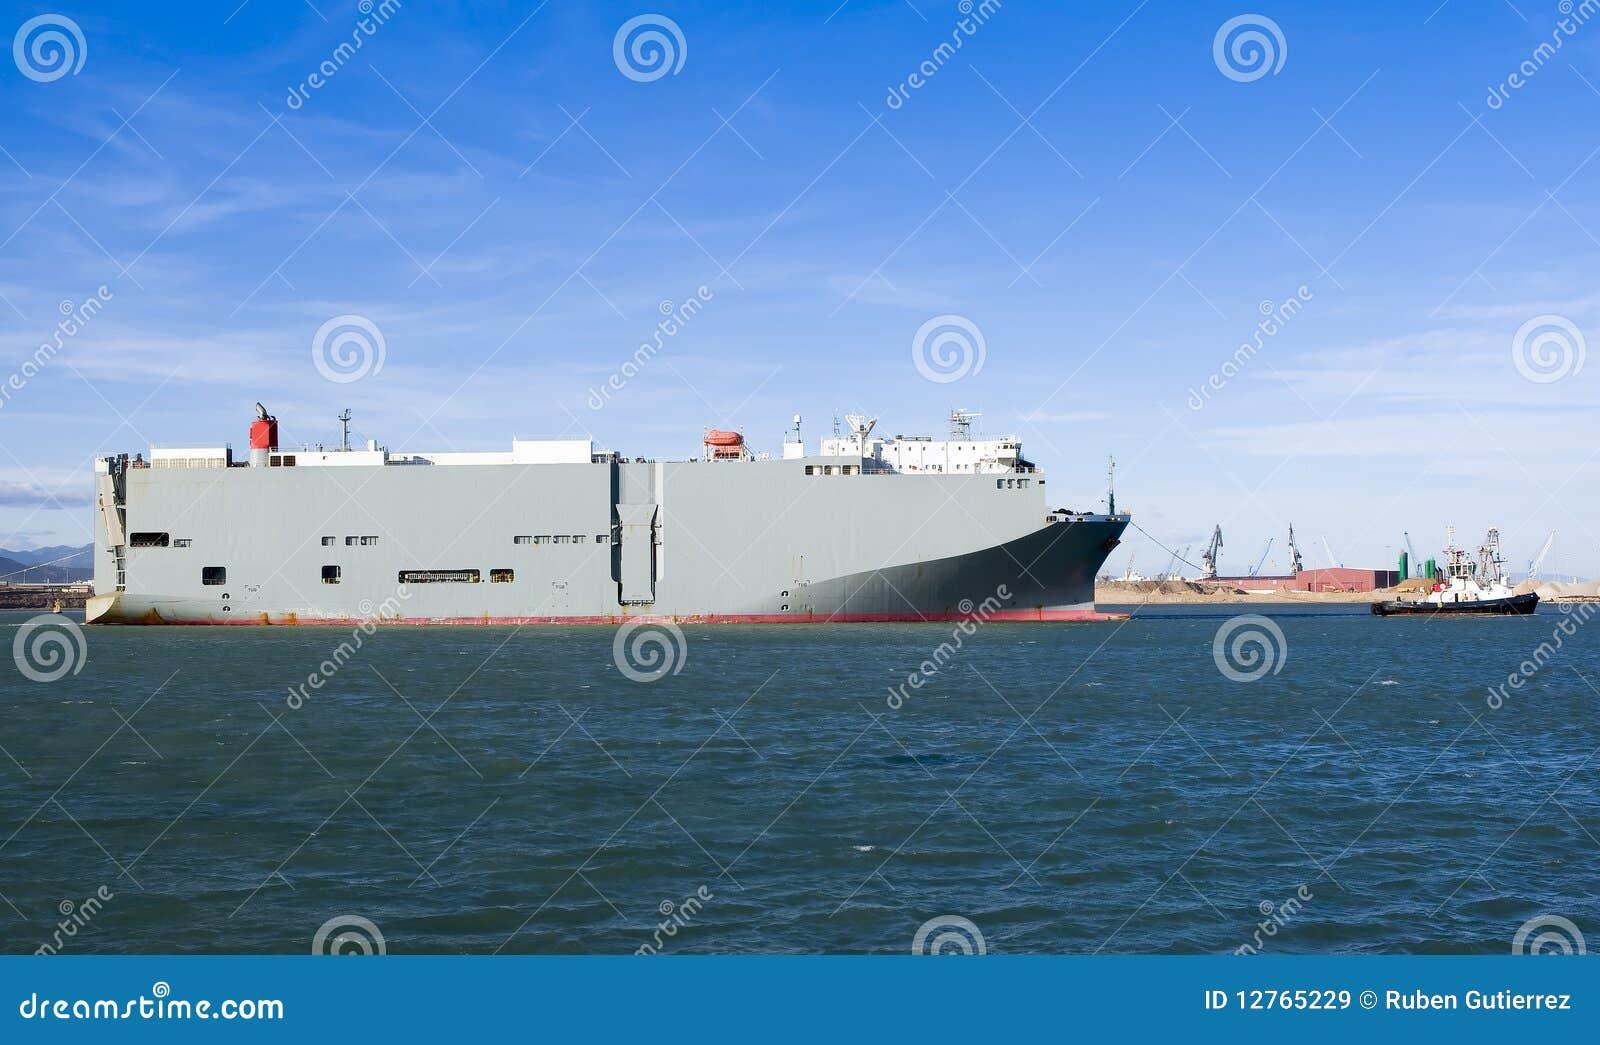 Roro vessel stock image  Image of port, ship, vessel - 12765229